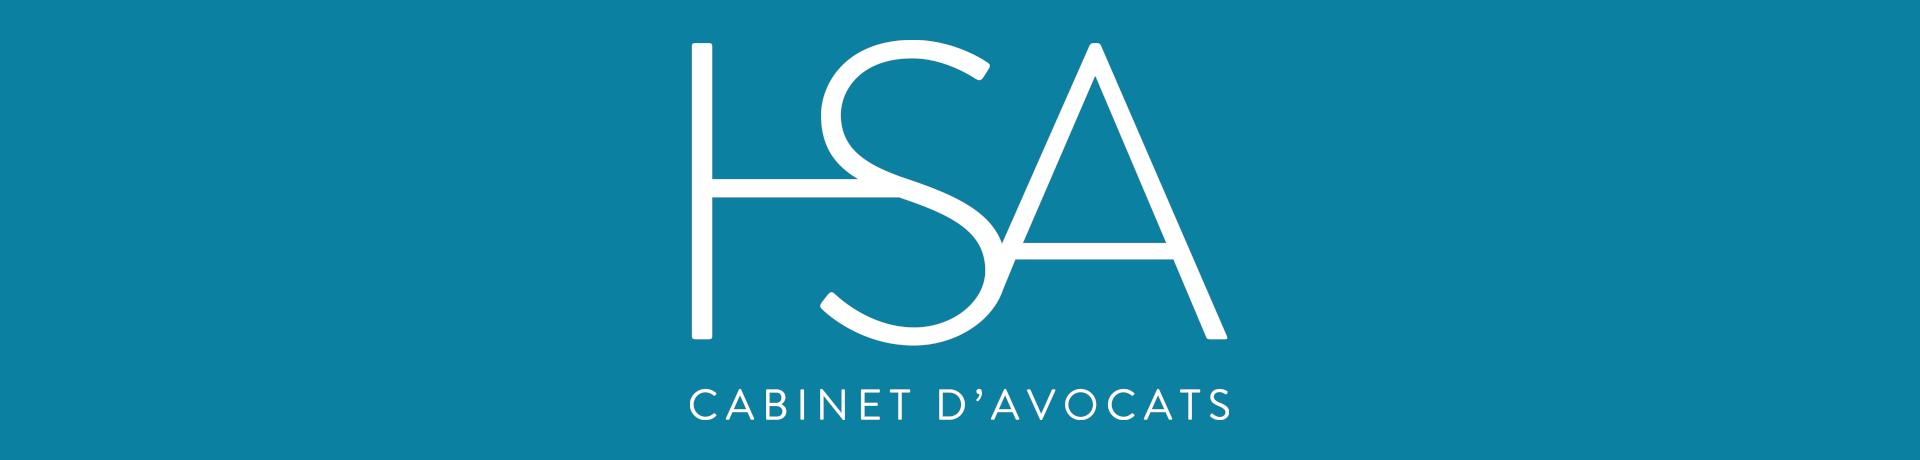 Cabinet HSA